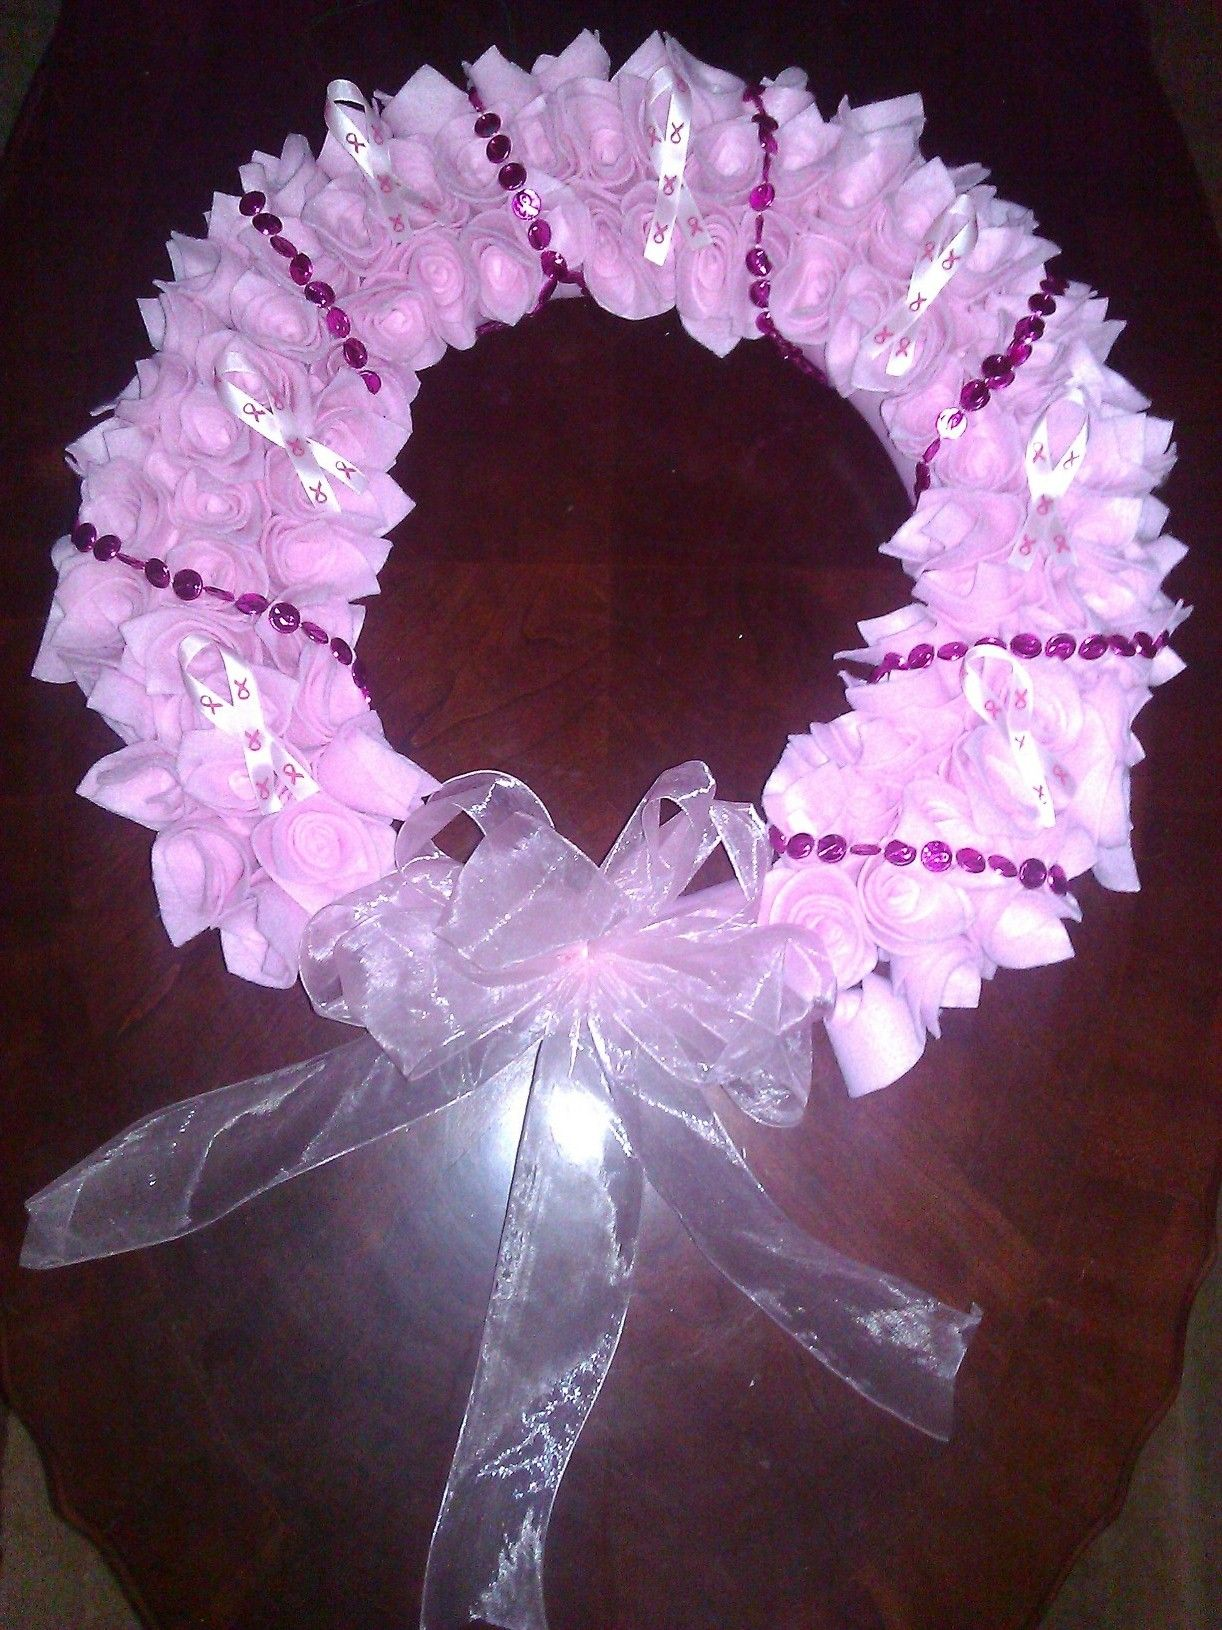 Breast Cancer Awareness Wreath  $60  Completelycustomcreations@yahoo.com